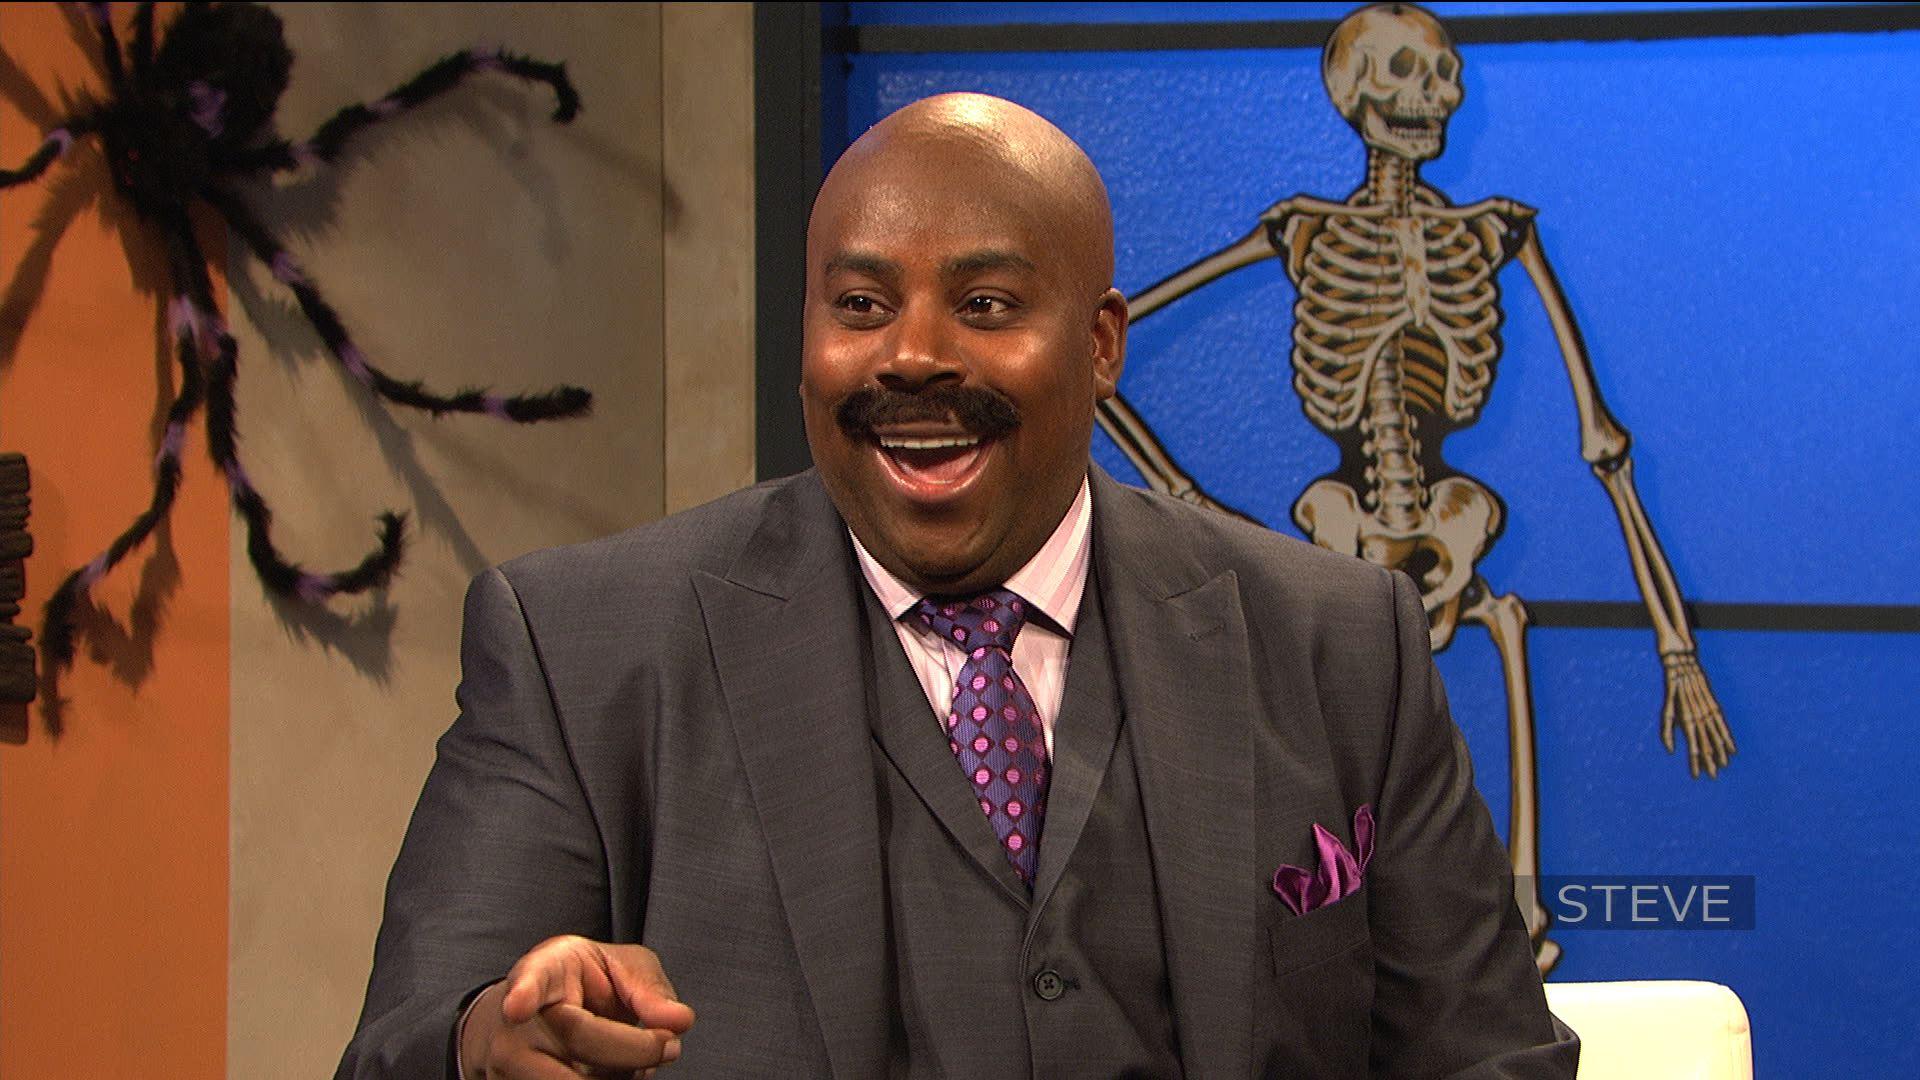 Kenan Thompson as Steve Harvey on NBC's Saturday Night Live